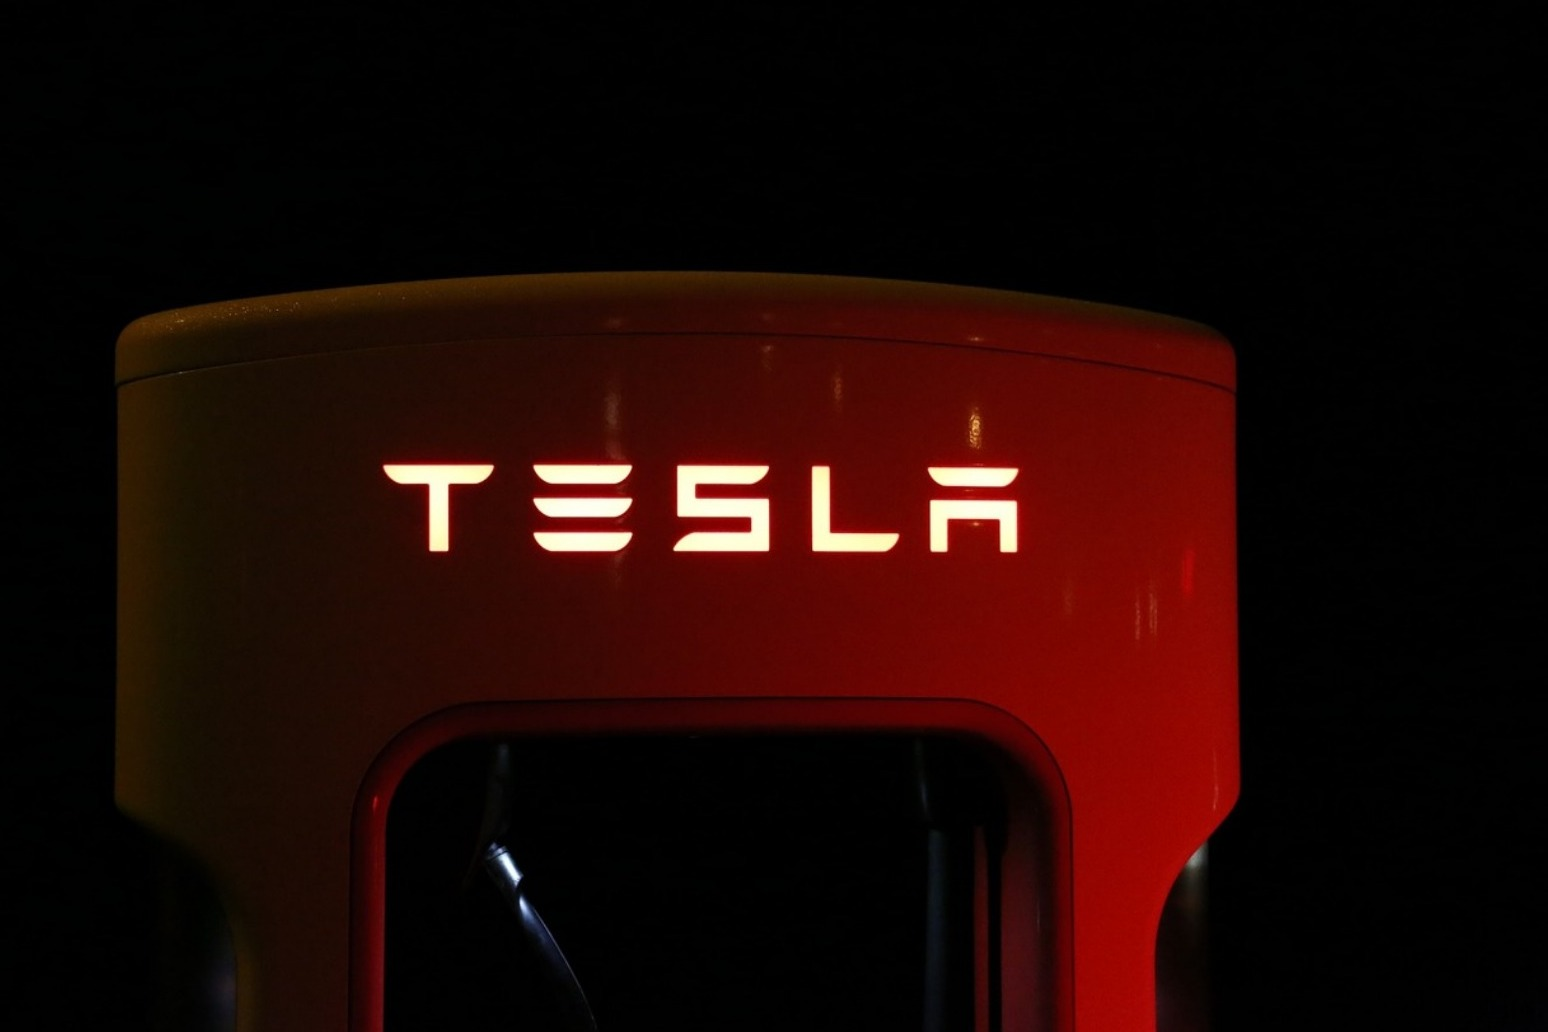 Tesla taking orders for its Model 3 car